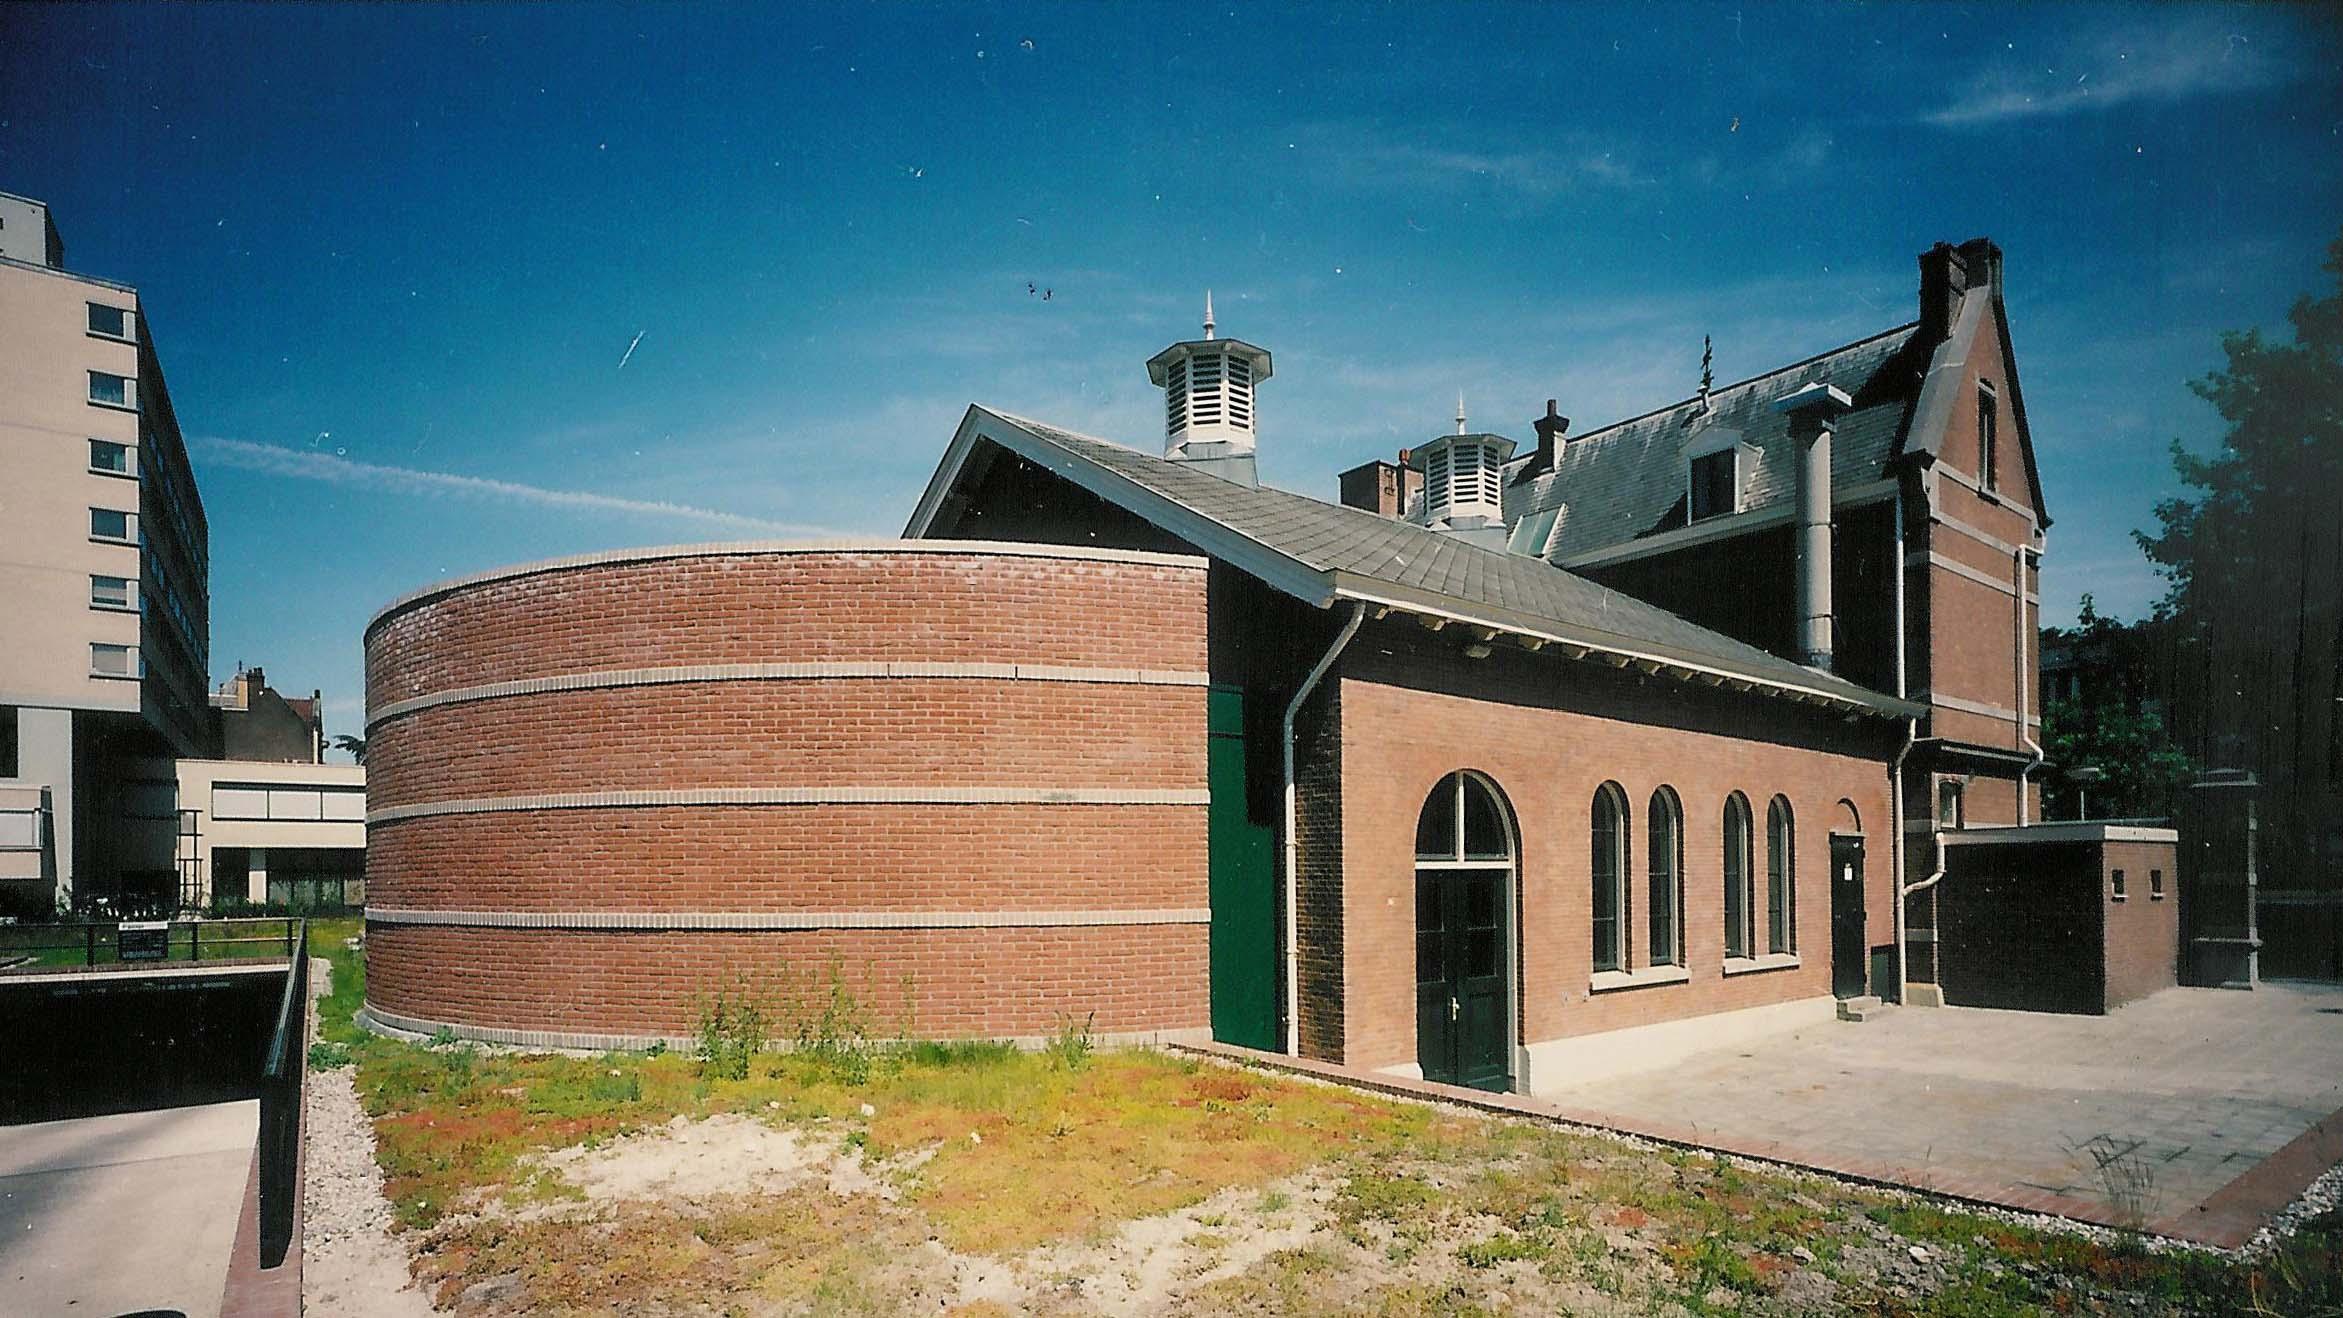 1995 RESTAURATIE MONUMENT rioolgemaal Westersingel ROTTERDAM ARCHITECT MARJA HARING